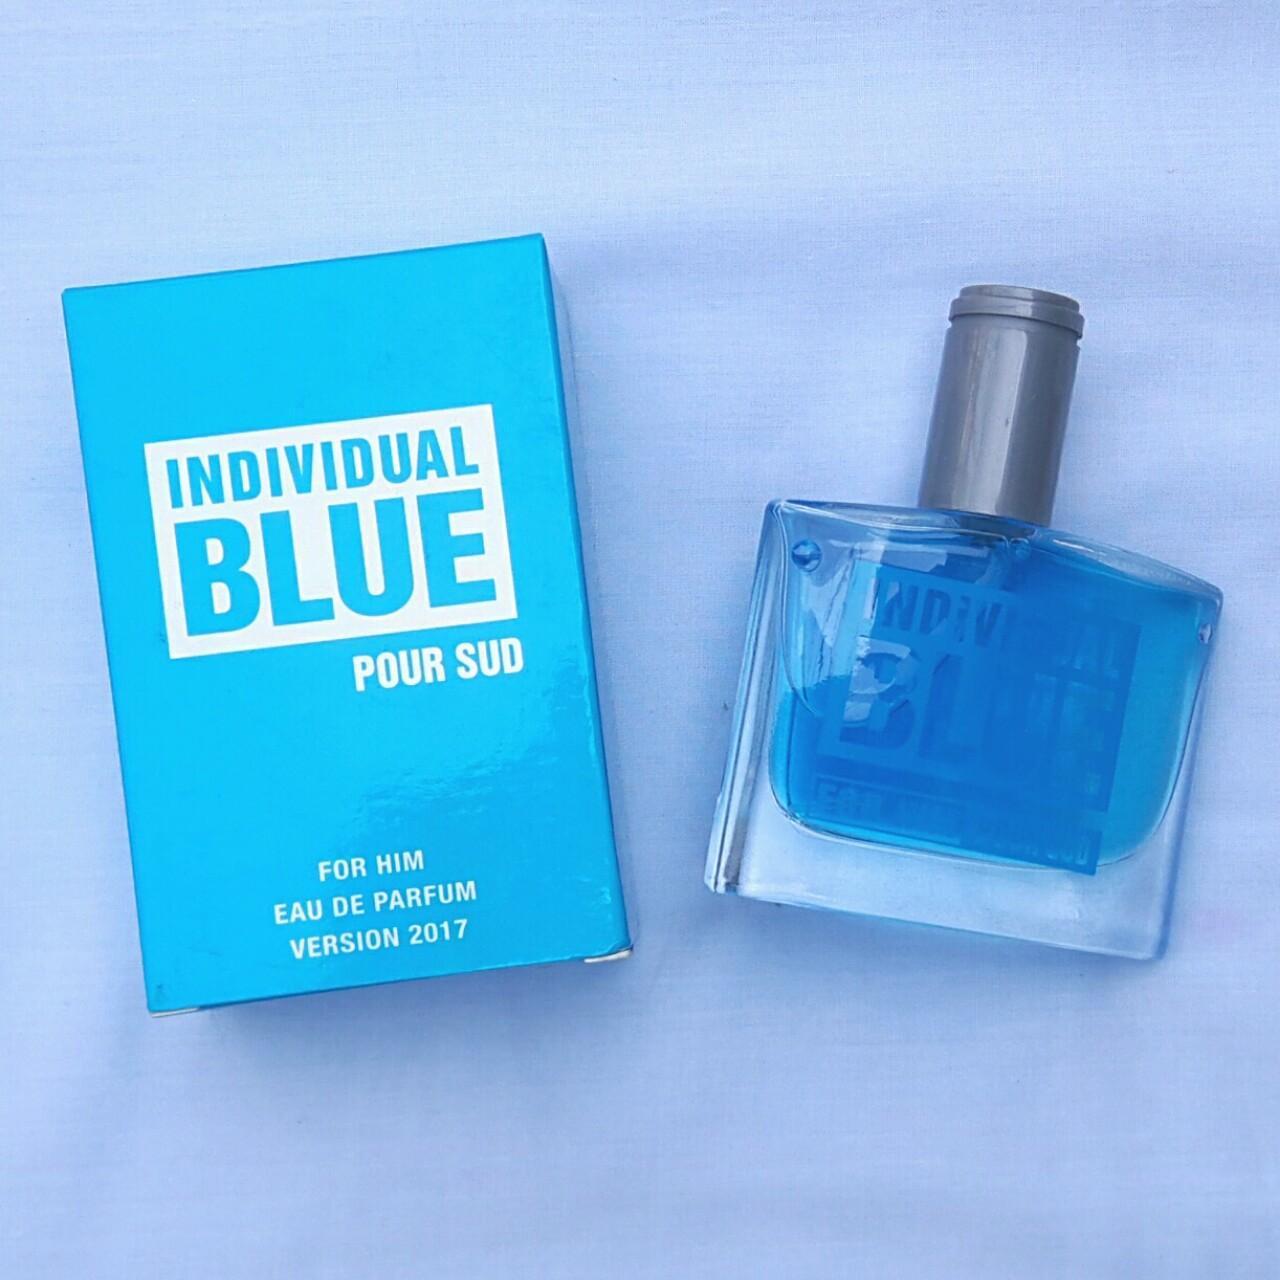 Nước Hoa Blue Pour Sud For Hir  50ml